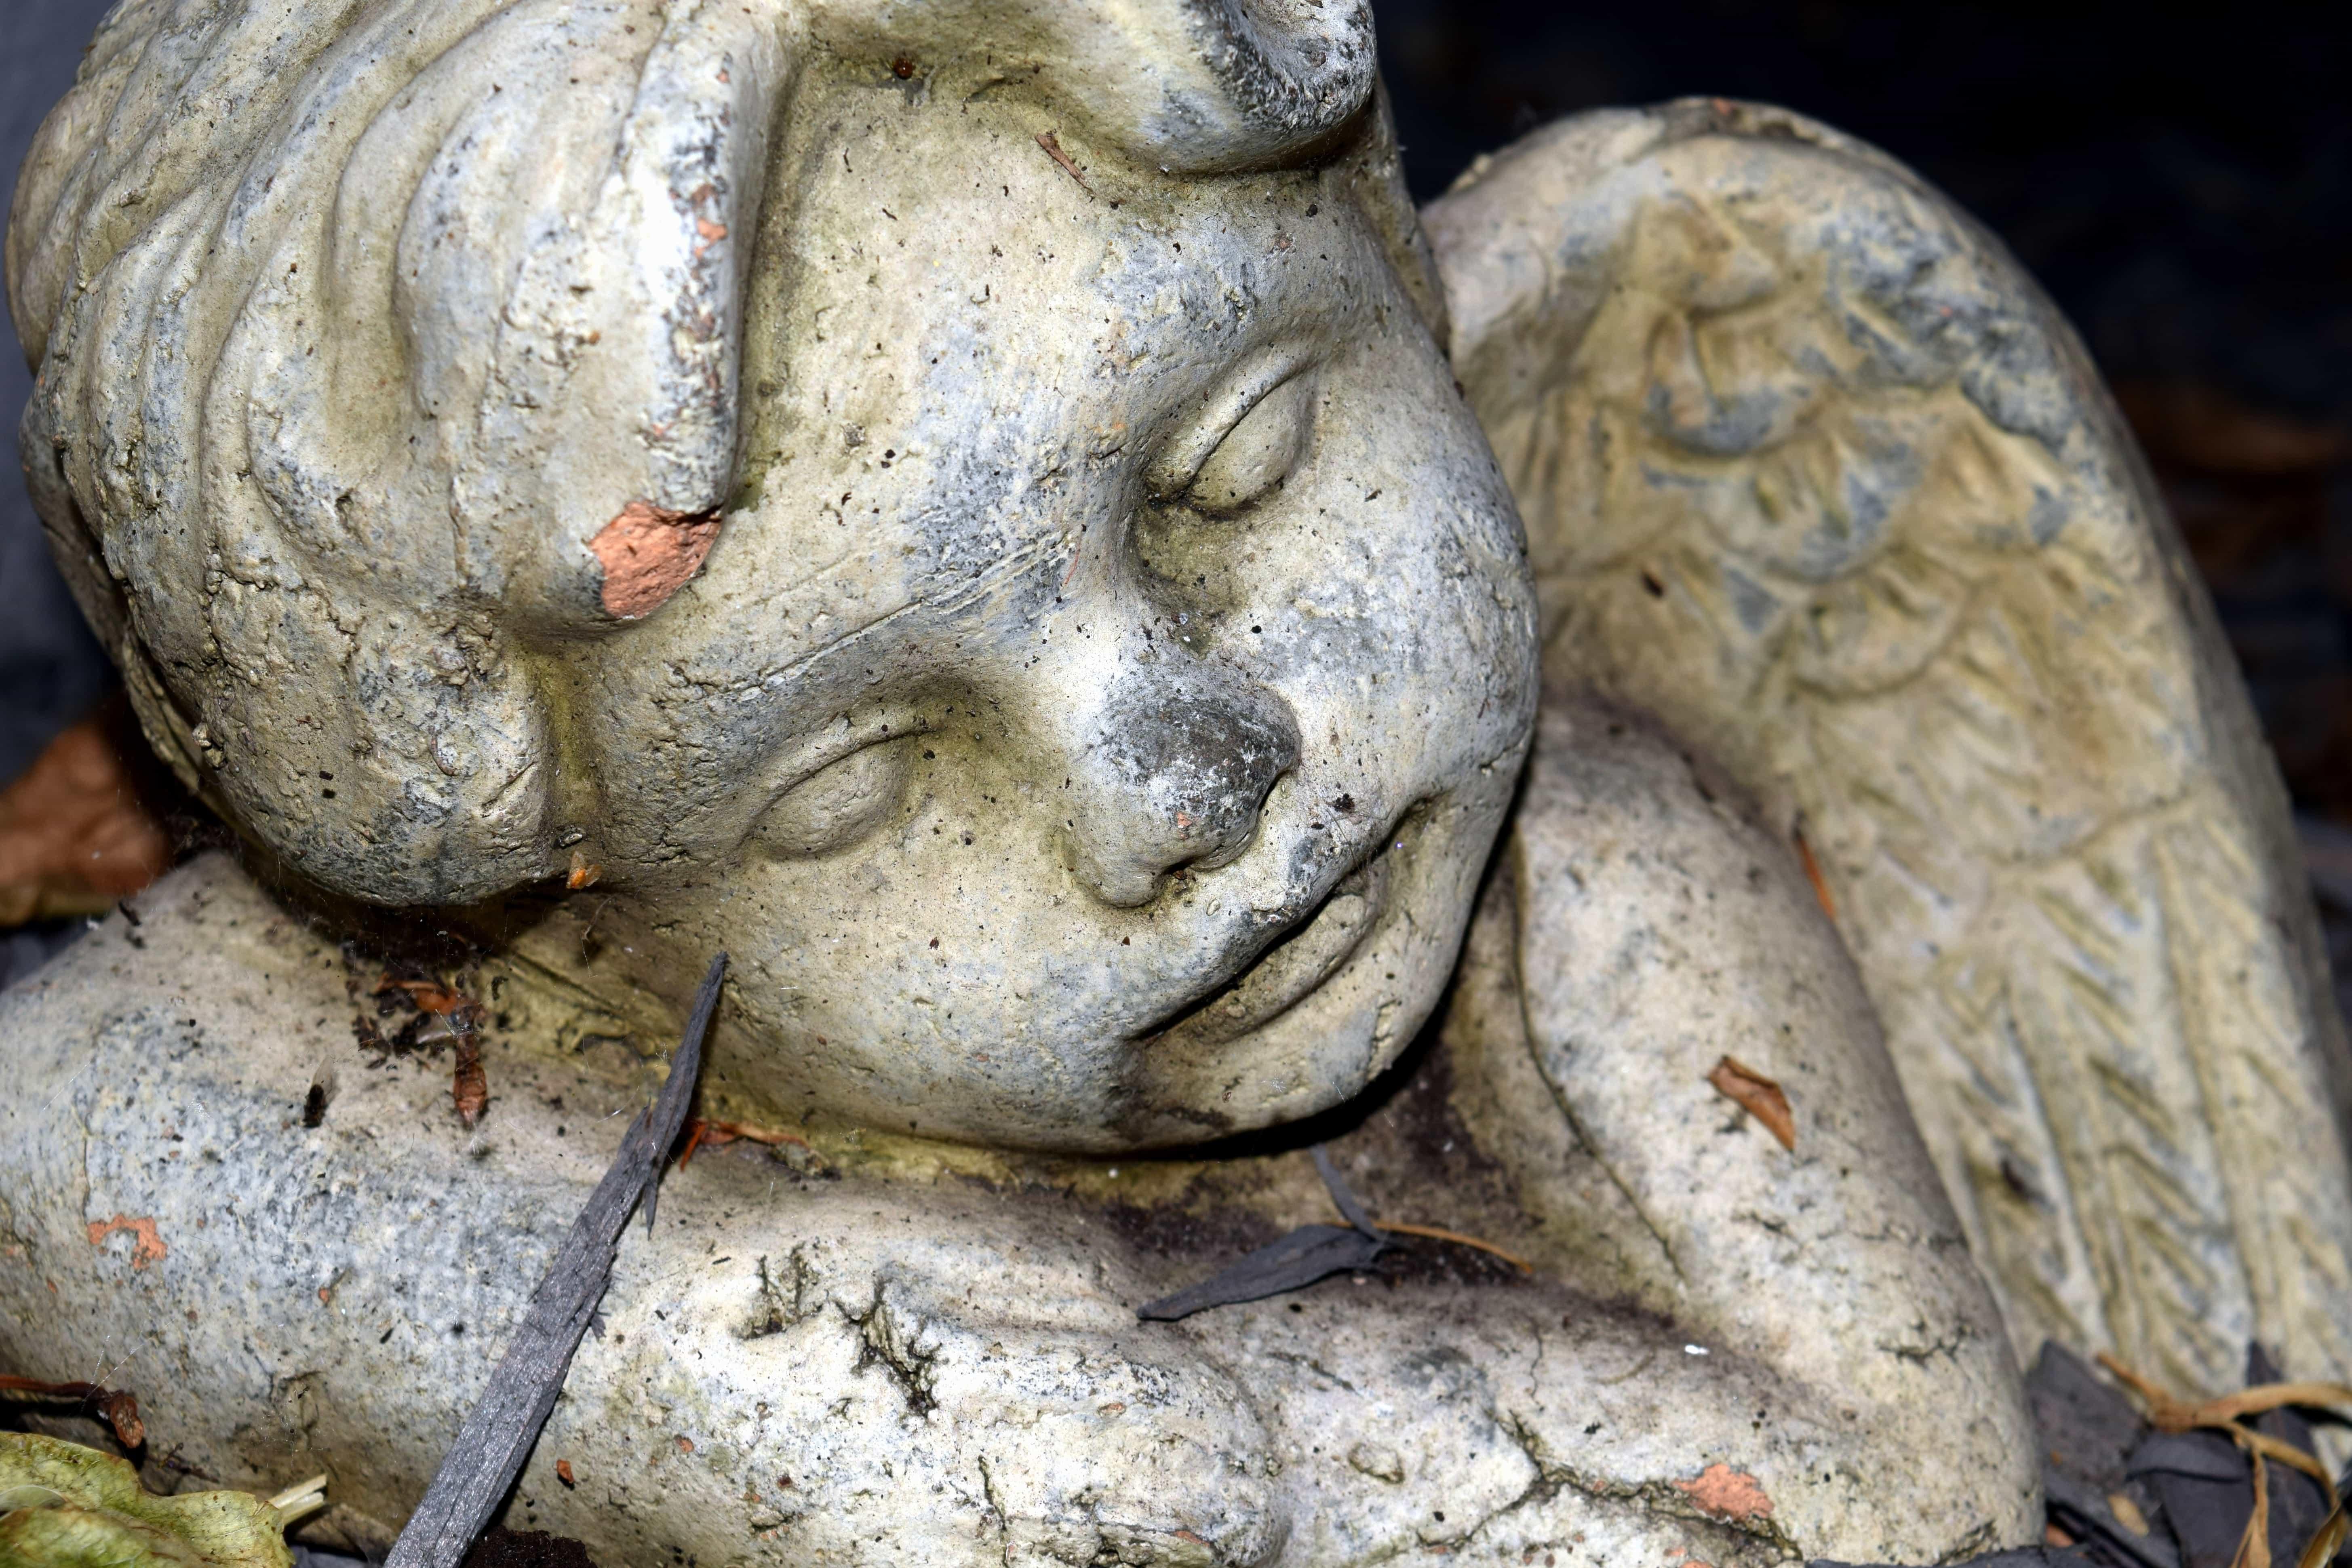 картинка ангел в грязи ладонь